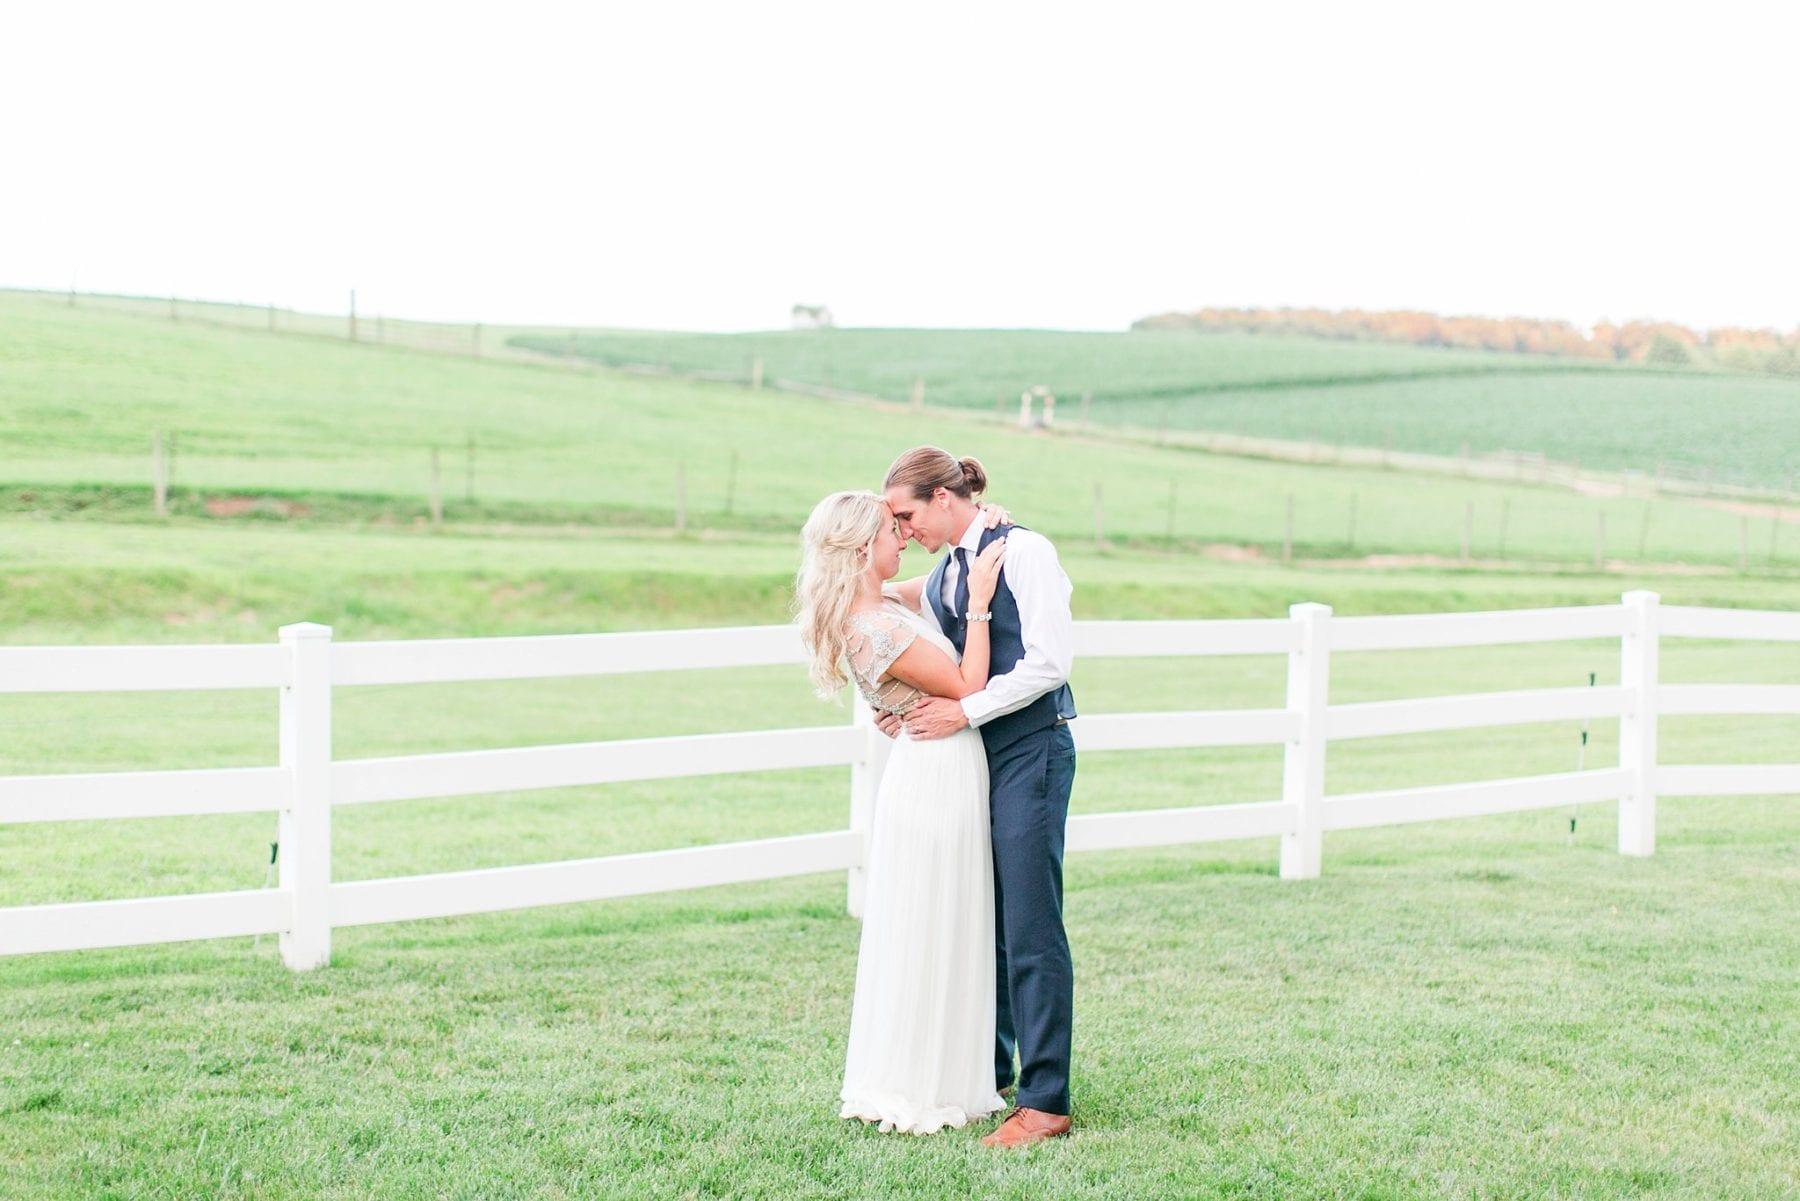 Pond View Farm Wedding Photos Maryland Wedding Photographer Kristen & Ryan Megan Kelsey Photography Blog-265.jpg